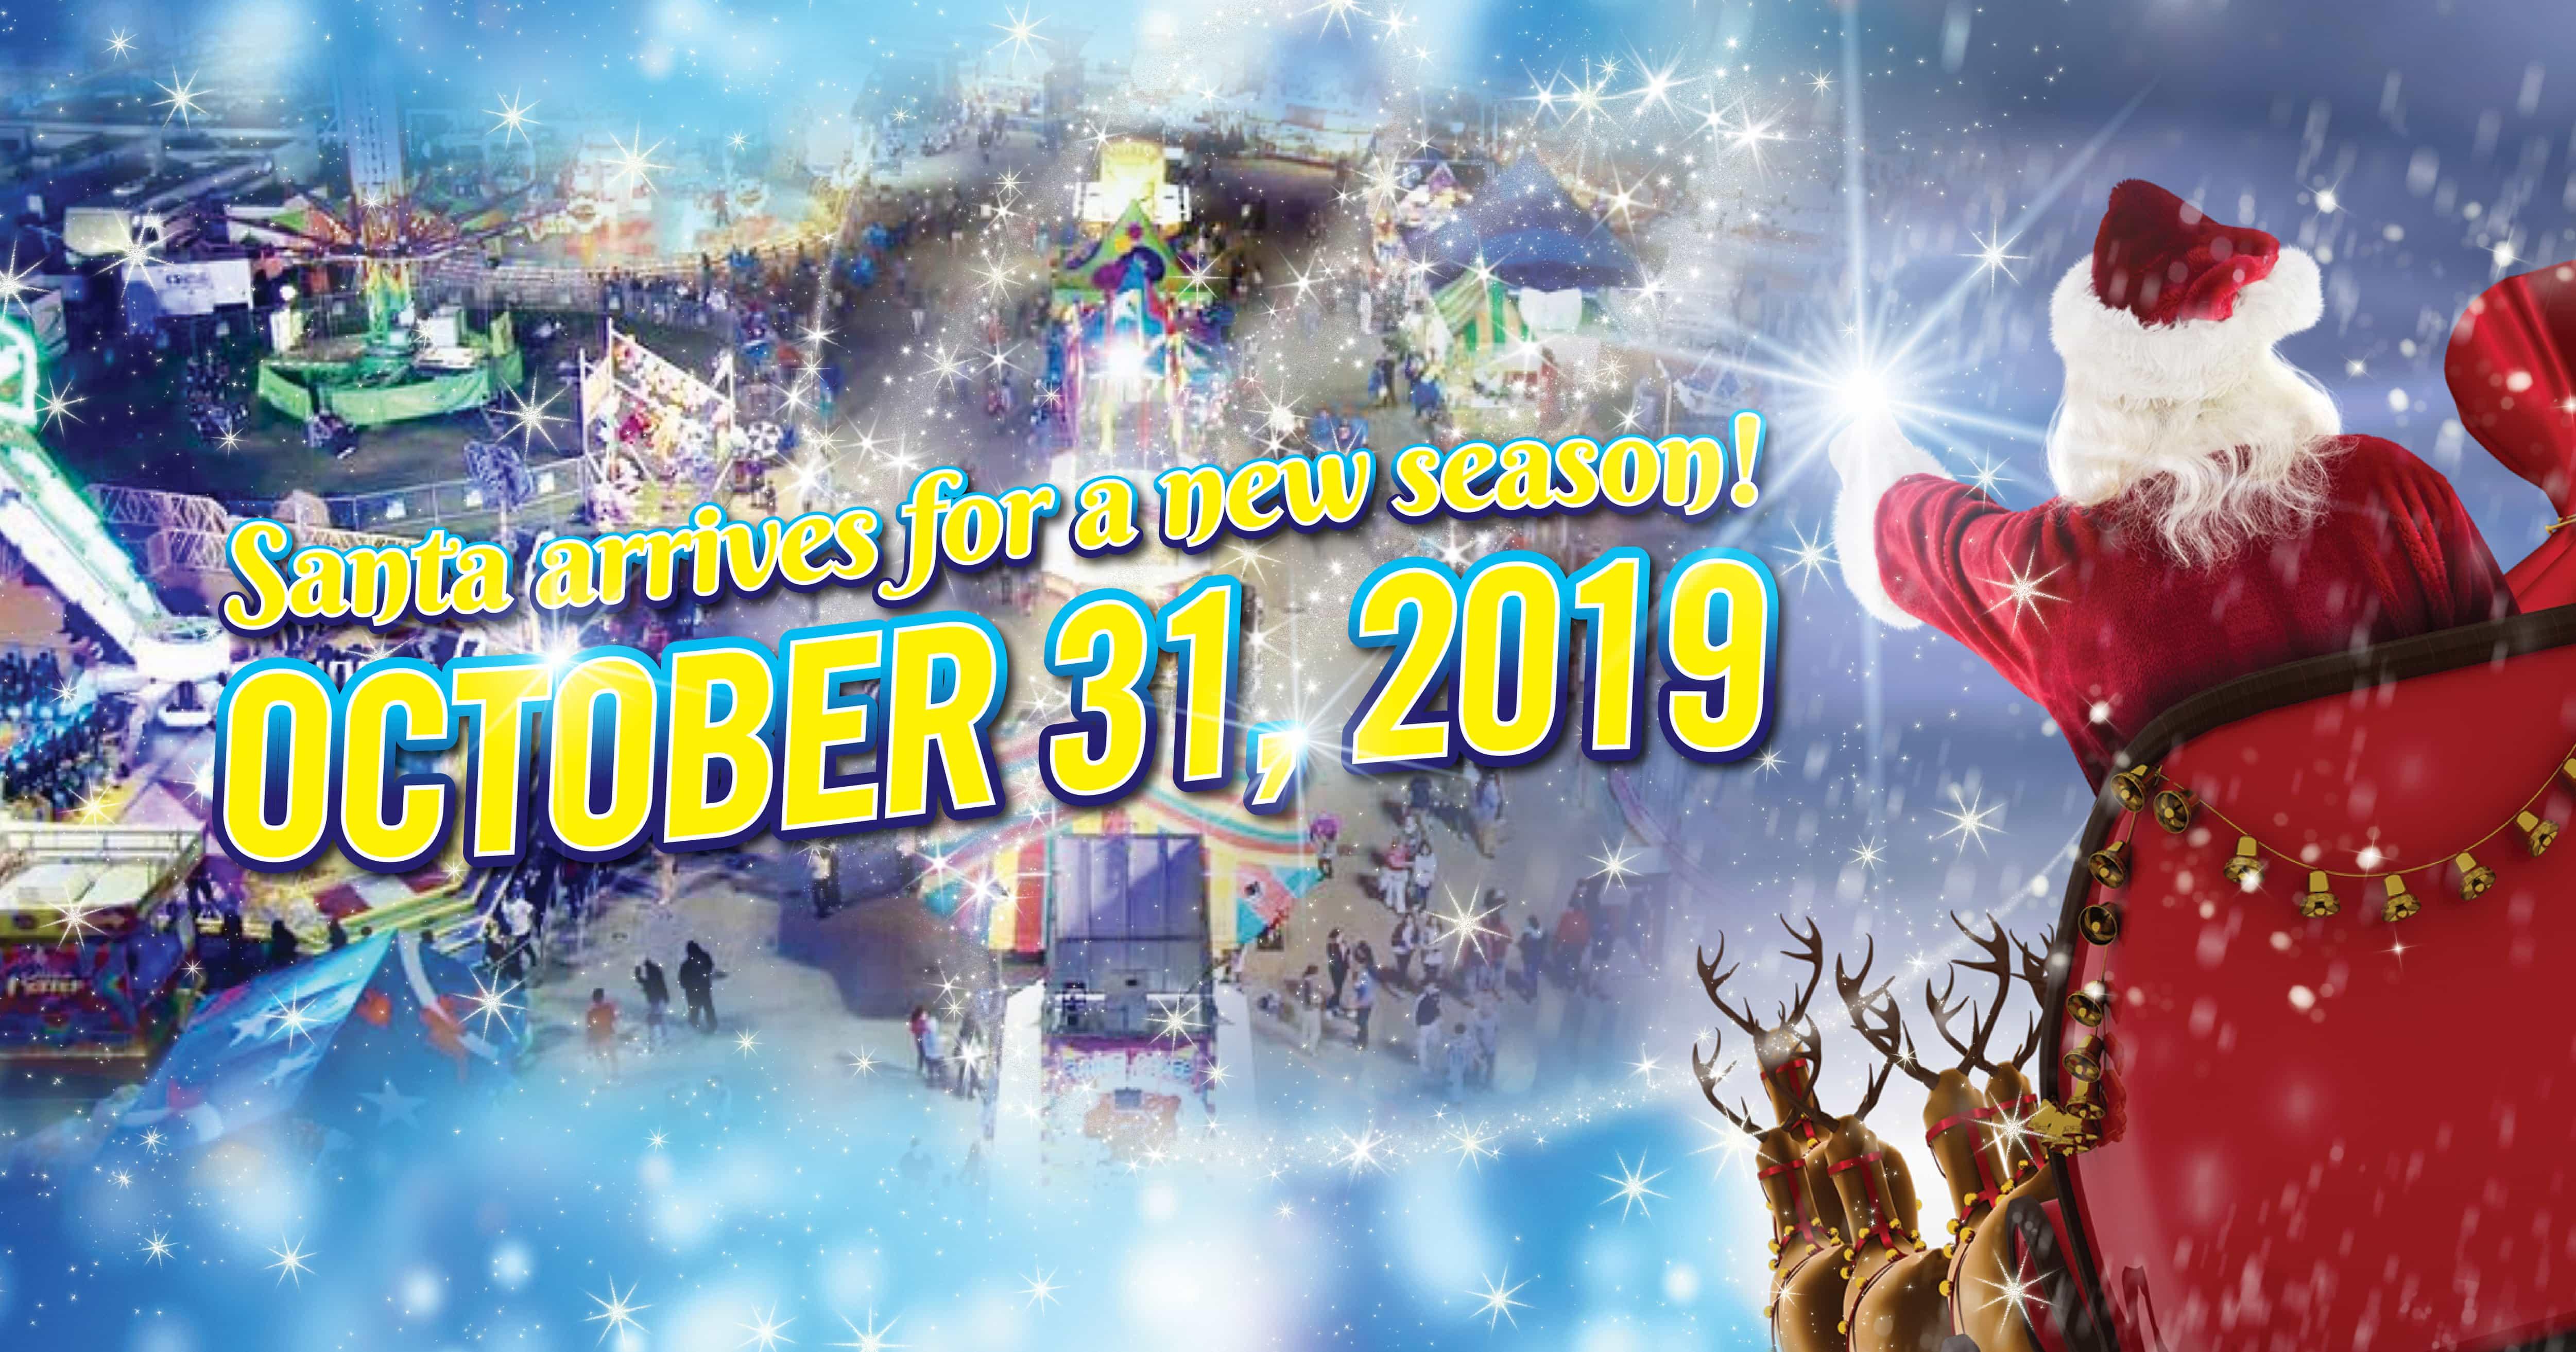 Santa Arrives for a New Season October 31, 2019.